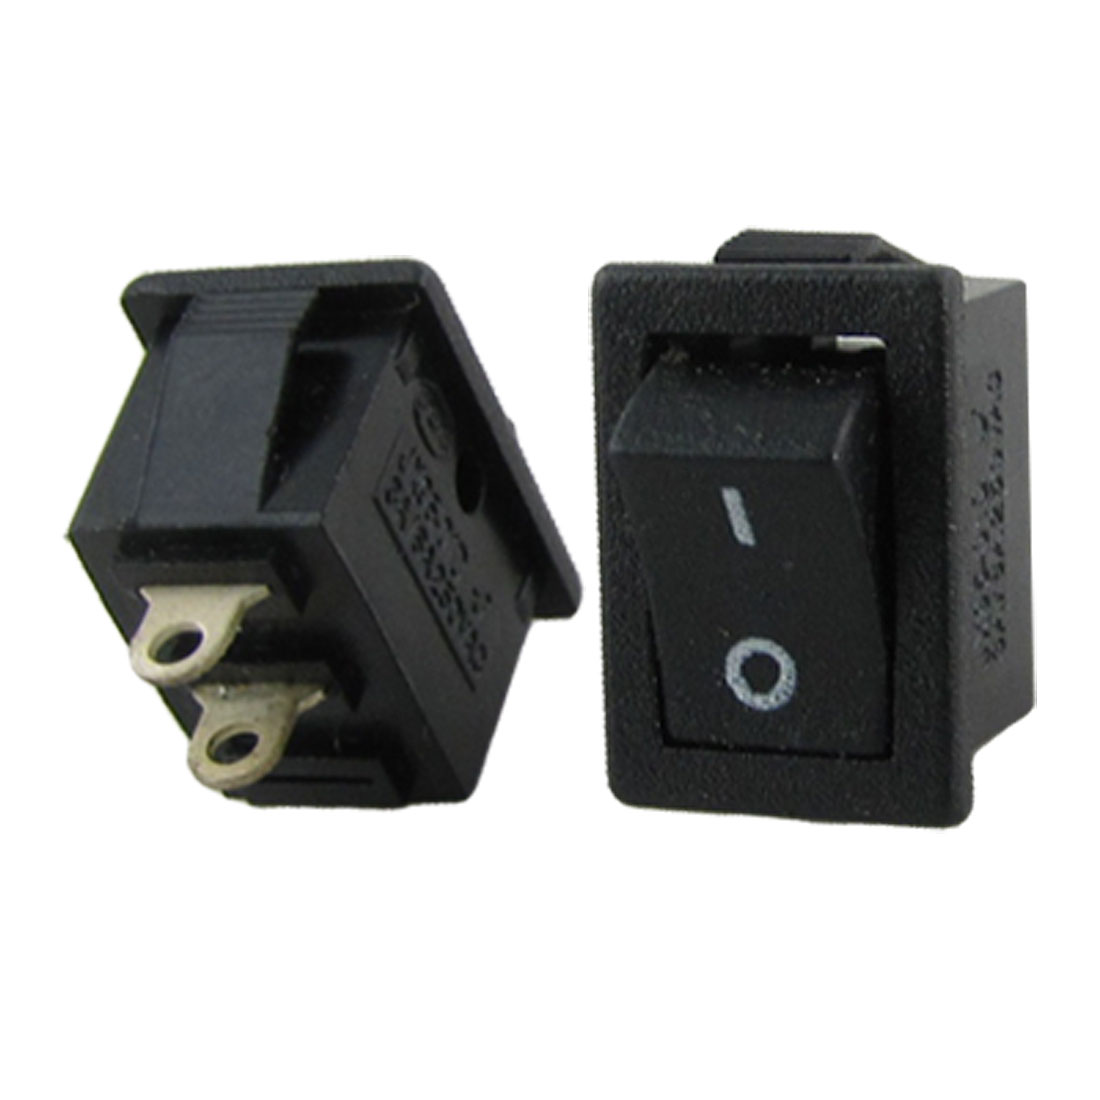 2 Pcs Black AC 250V 3A 2 Pin SPST On/Off Snap in Boat Rocker Switch 12.7x8.9mm